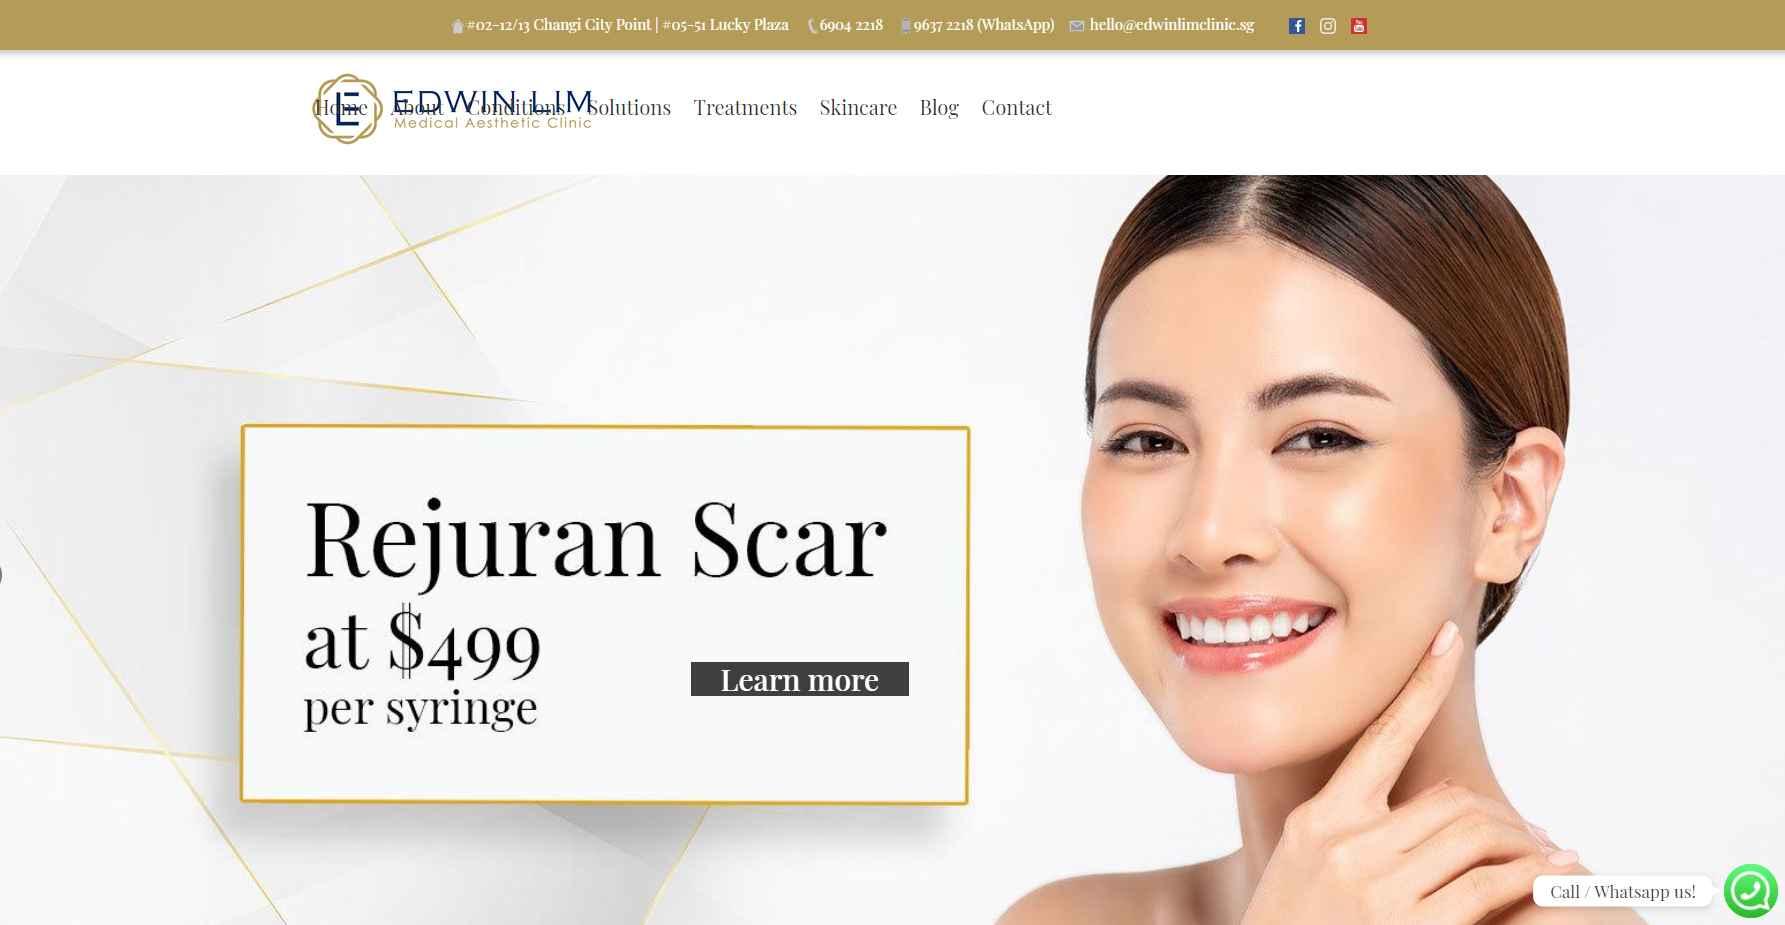 edwin lim clinic Top Botox Clinics in Singapore